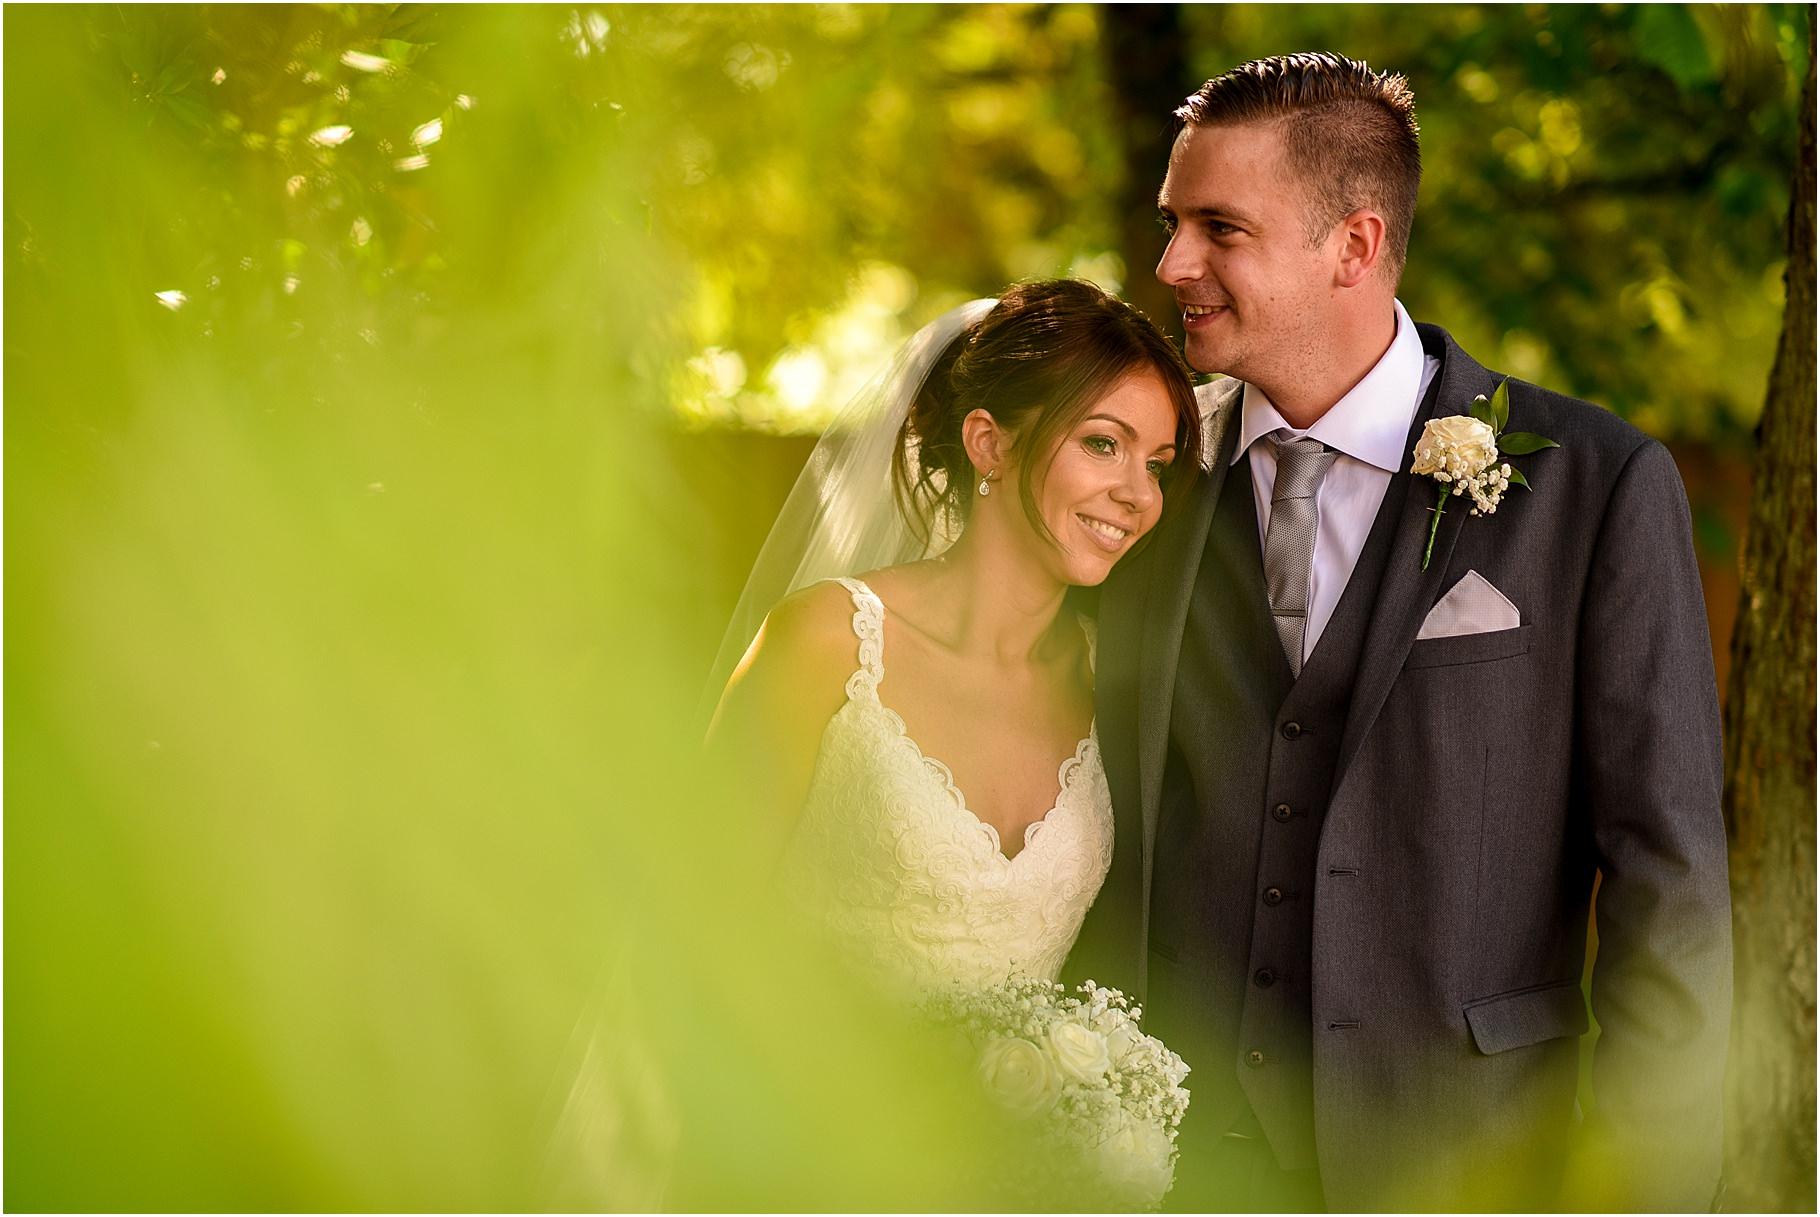 the-villa-wrea-green-wedding-photographer-54.jpg